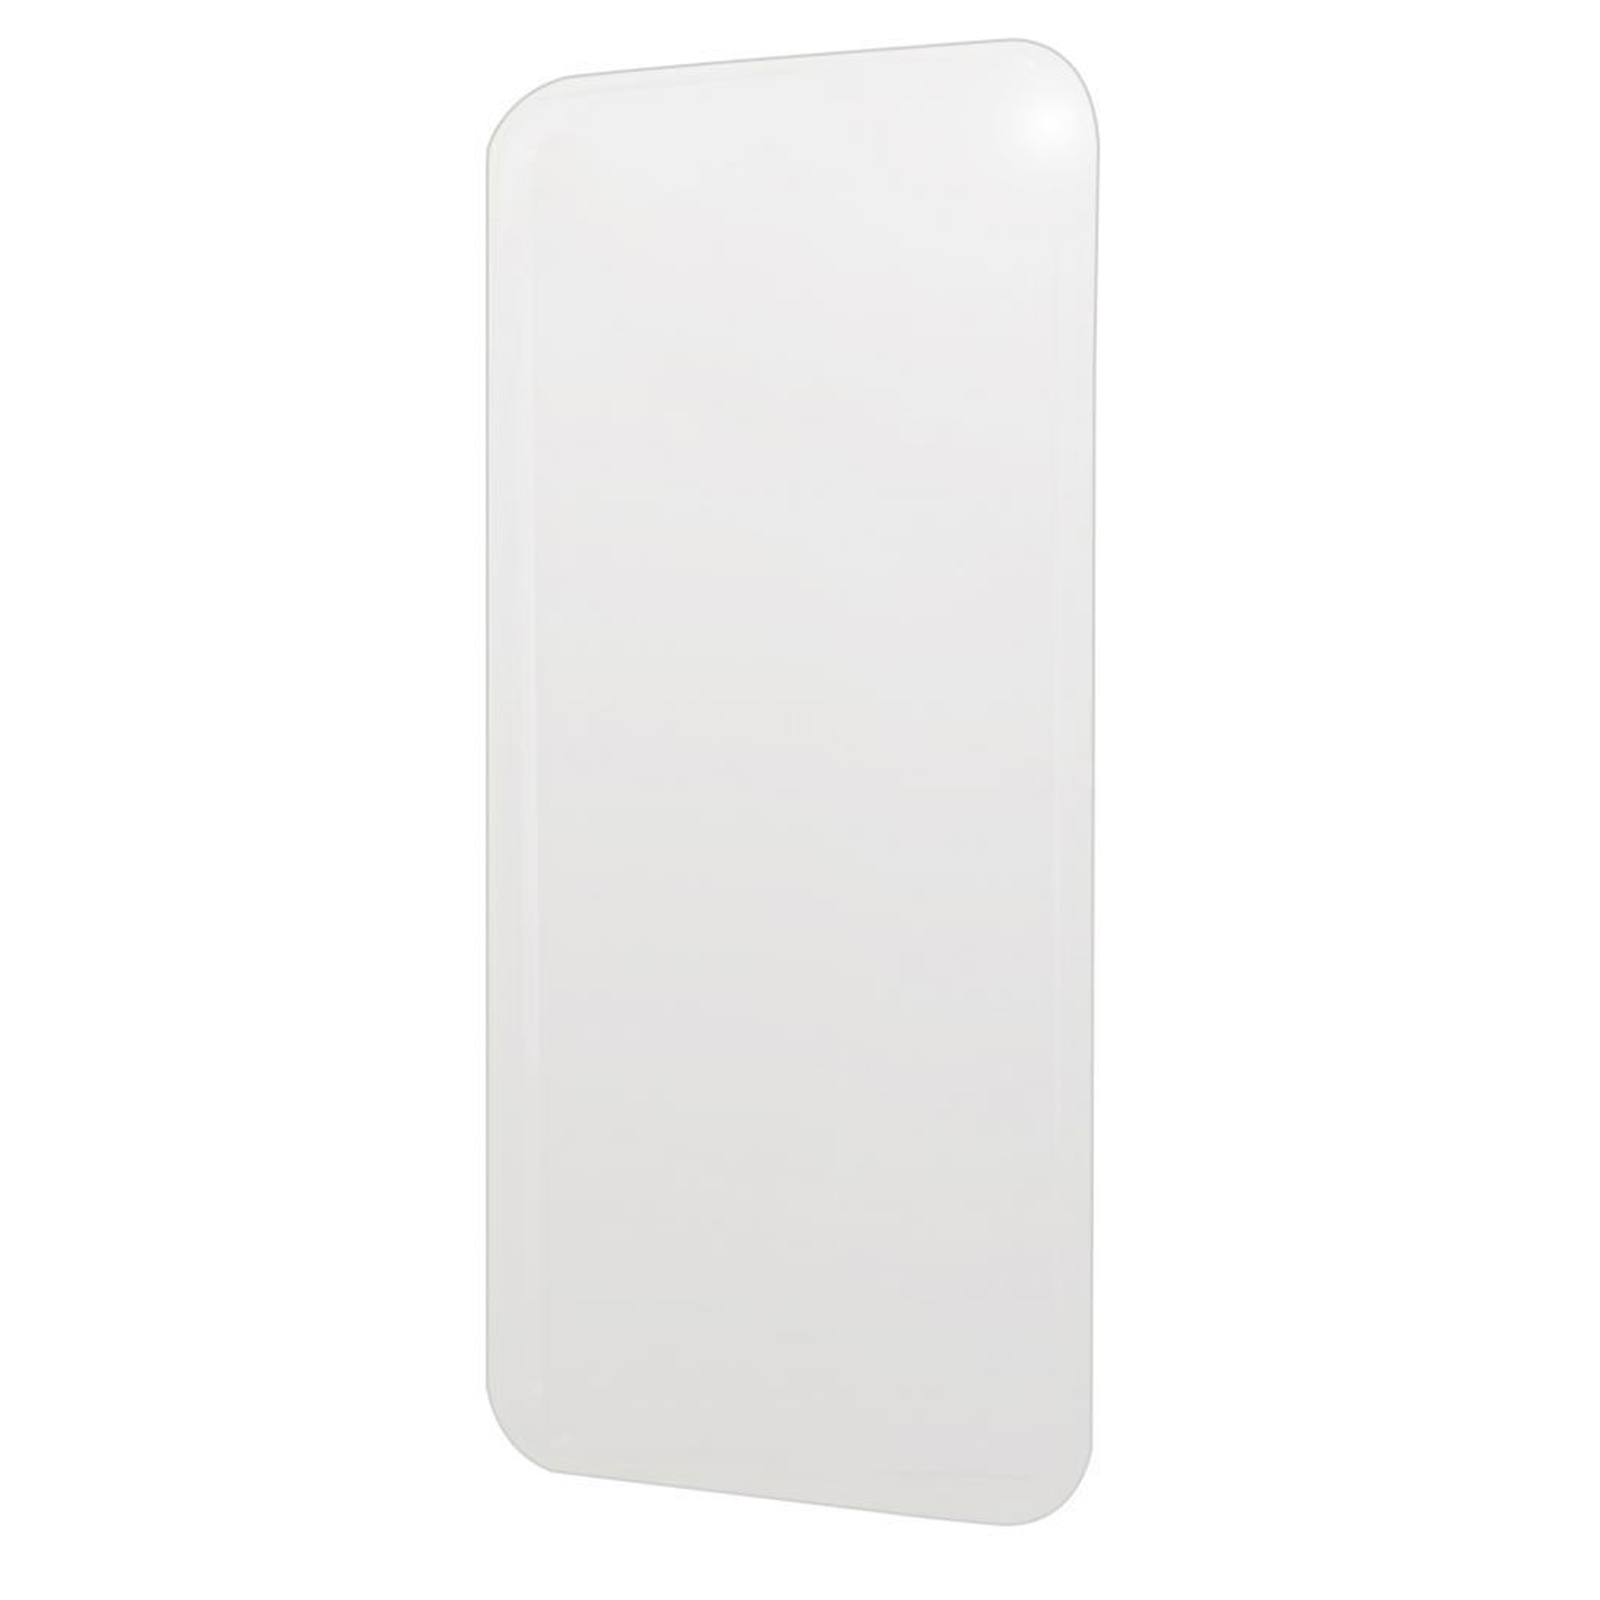 Чехол для моб. телефона Pro-case для Samsung Galaxy A7 (A710) transparent (CP-307-TRN)